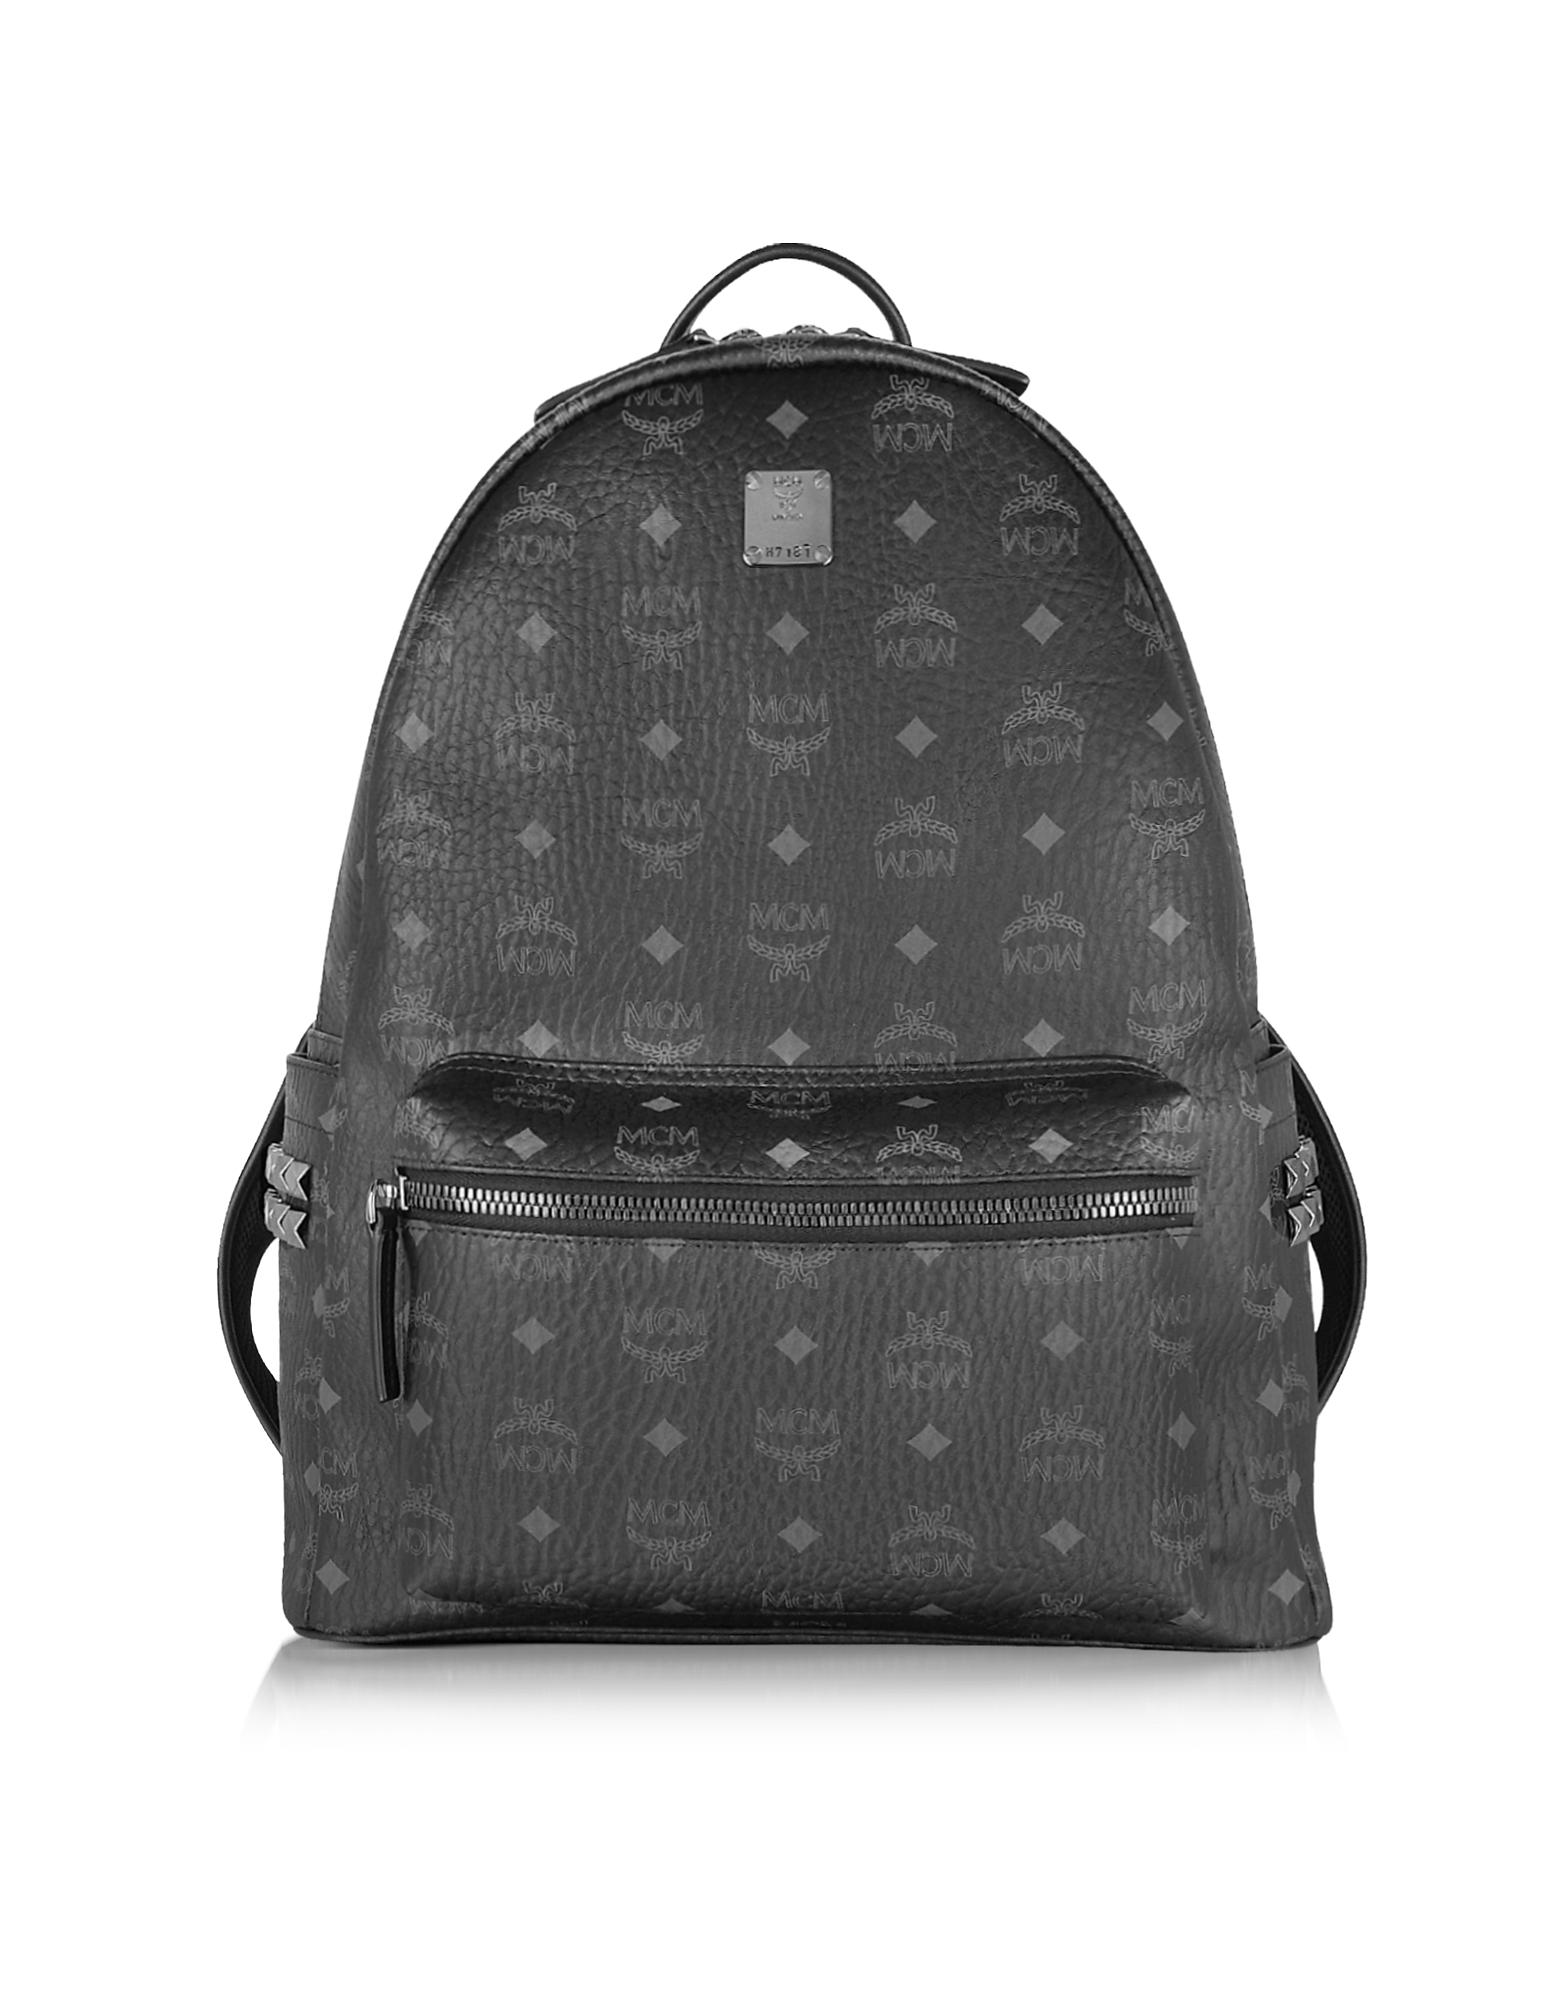 MCM Handbags, Black Stark Medium Backpack